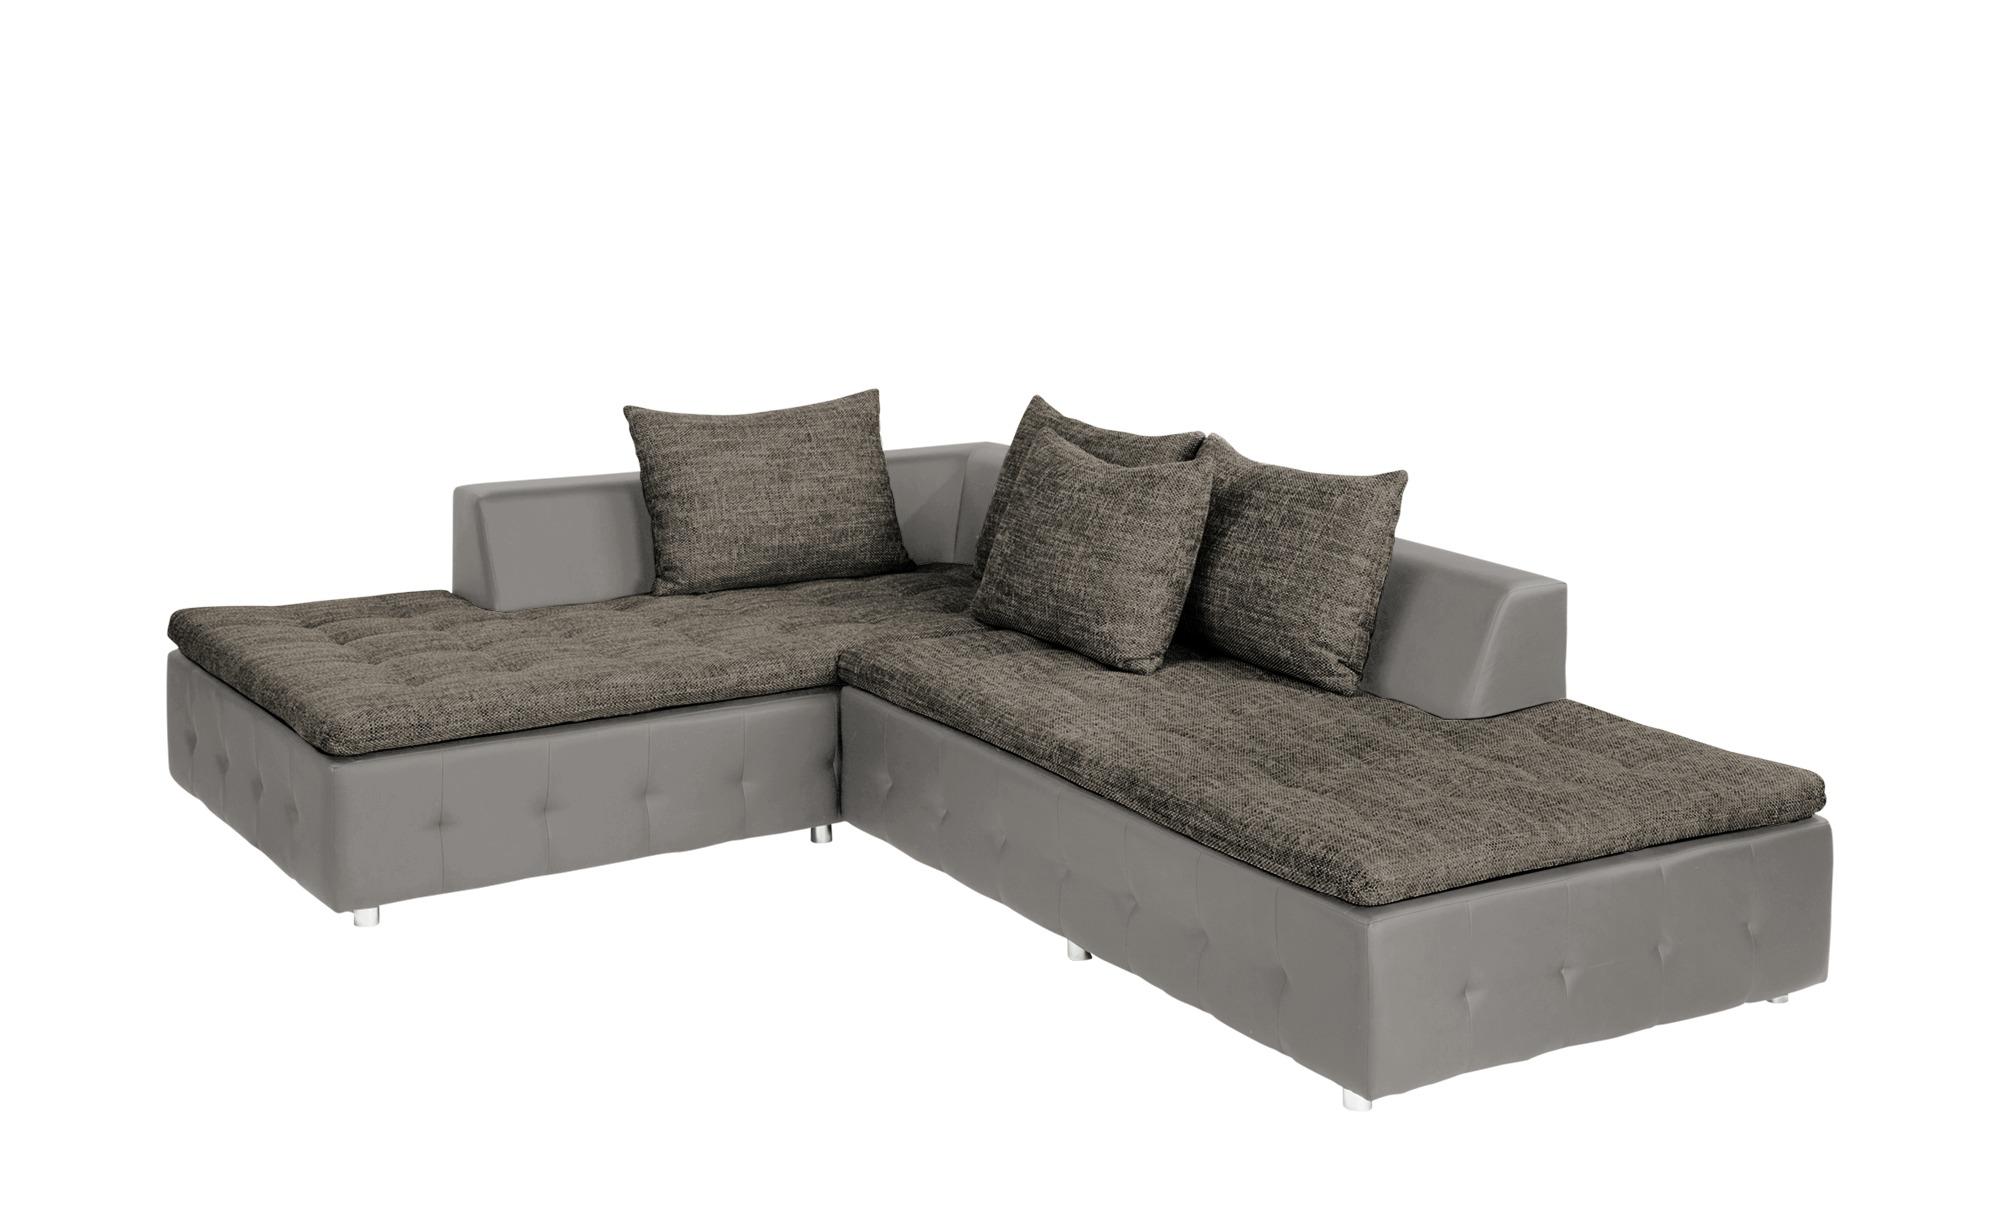 smart graues ecksofa salvia breite h he grau online kaufen bei woonio. Black Bedroom Furniture Sets. Home Design Ideas